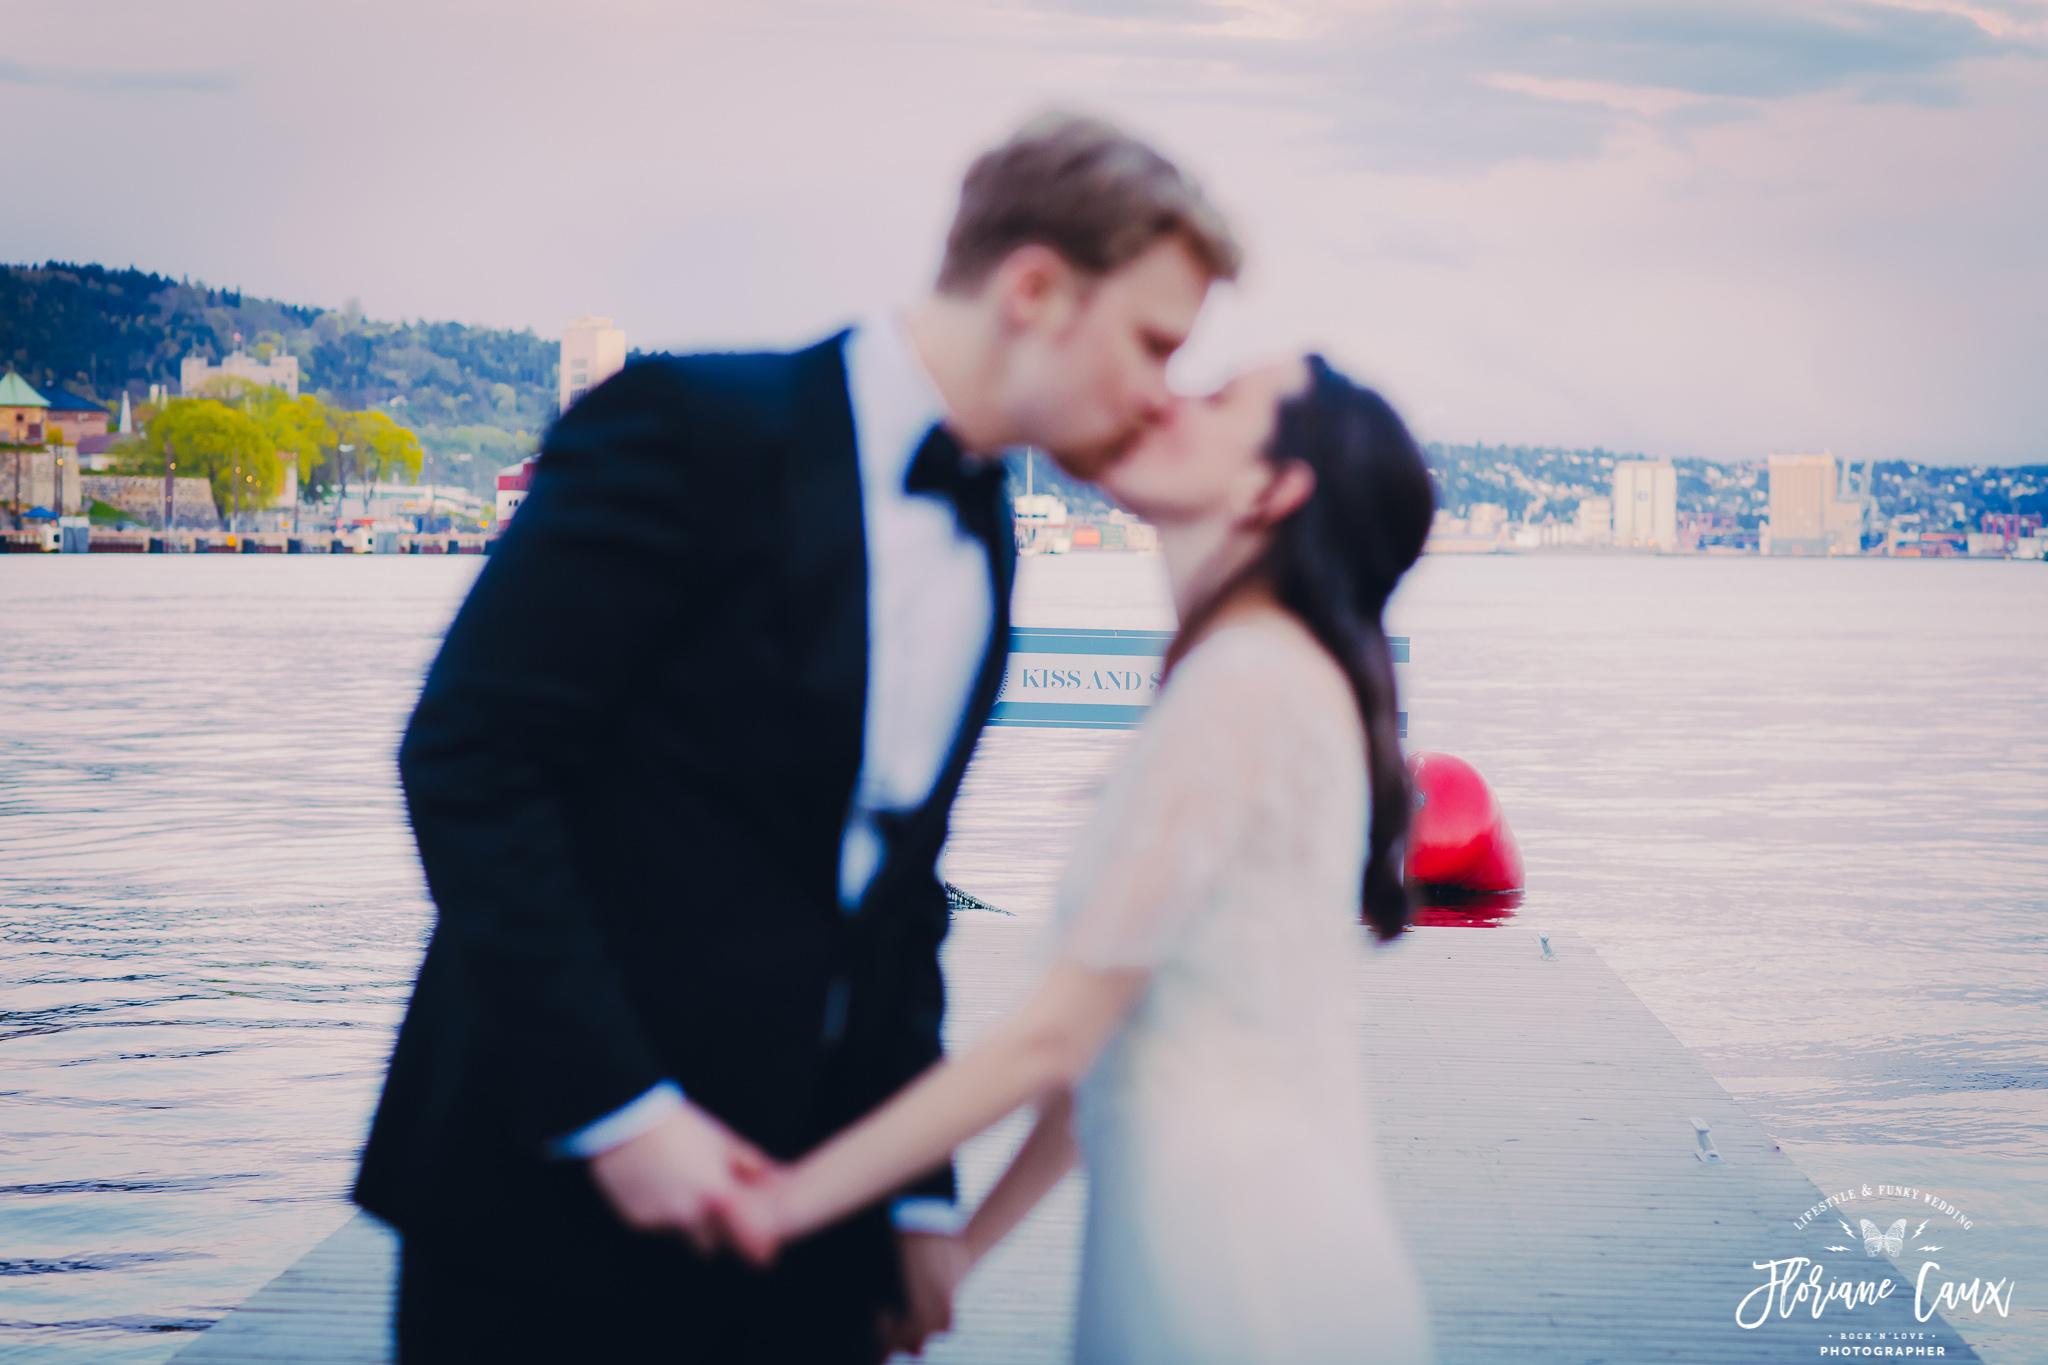 destination-wedding-photographer-oslo-norway-floriane-caux-54